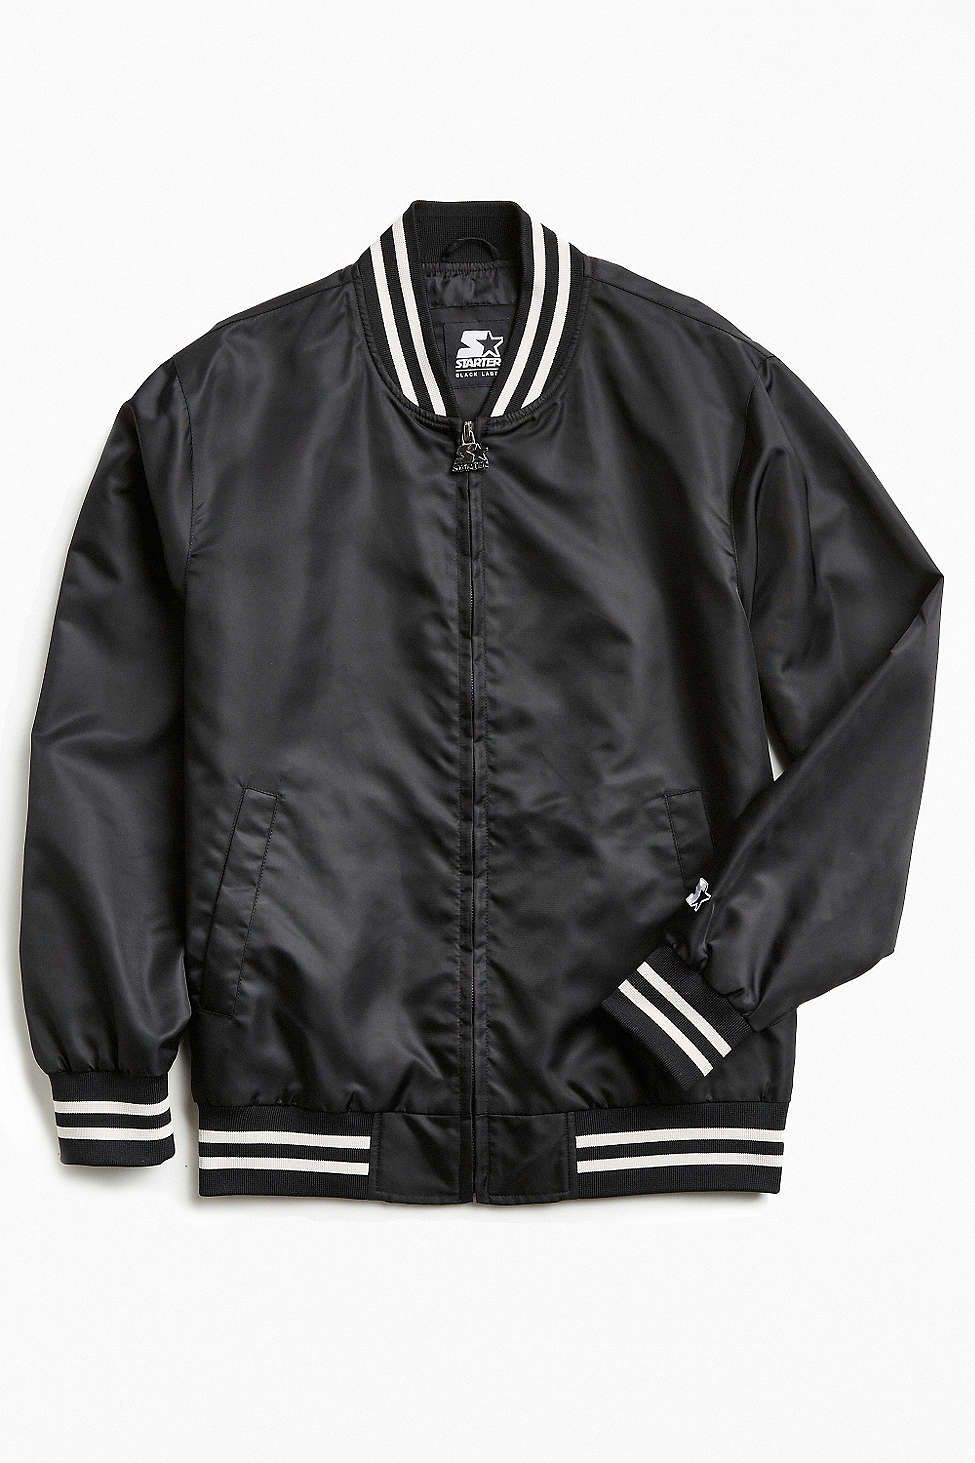 Starter Black Label Uo Athletic Bomber Jacket Stylish Bomber Jacket Bomber Jacket Men Bomber Jacket [ 1463 x 975 Pixel ]